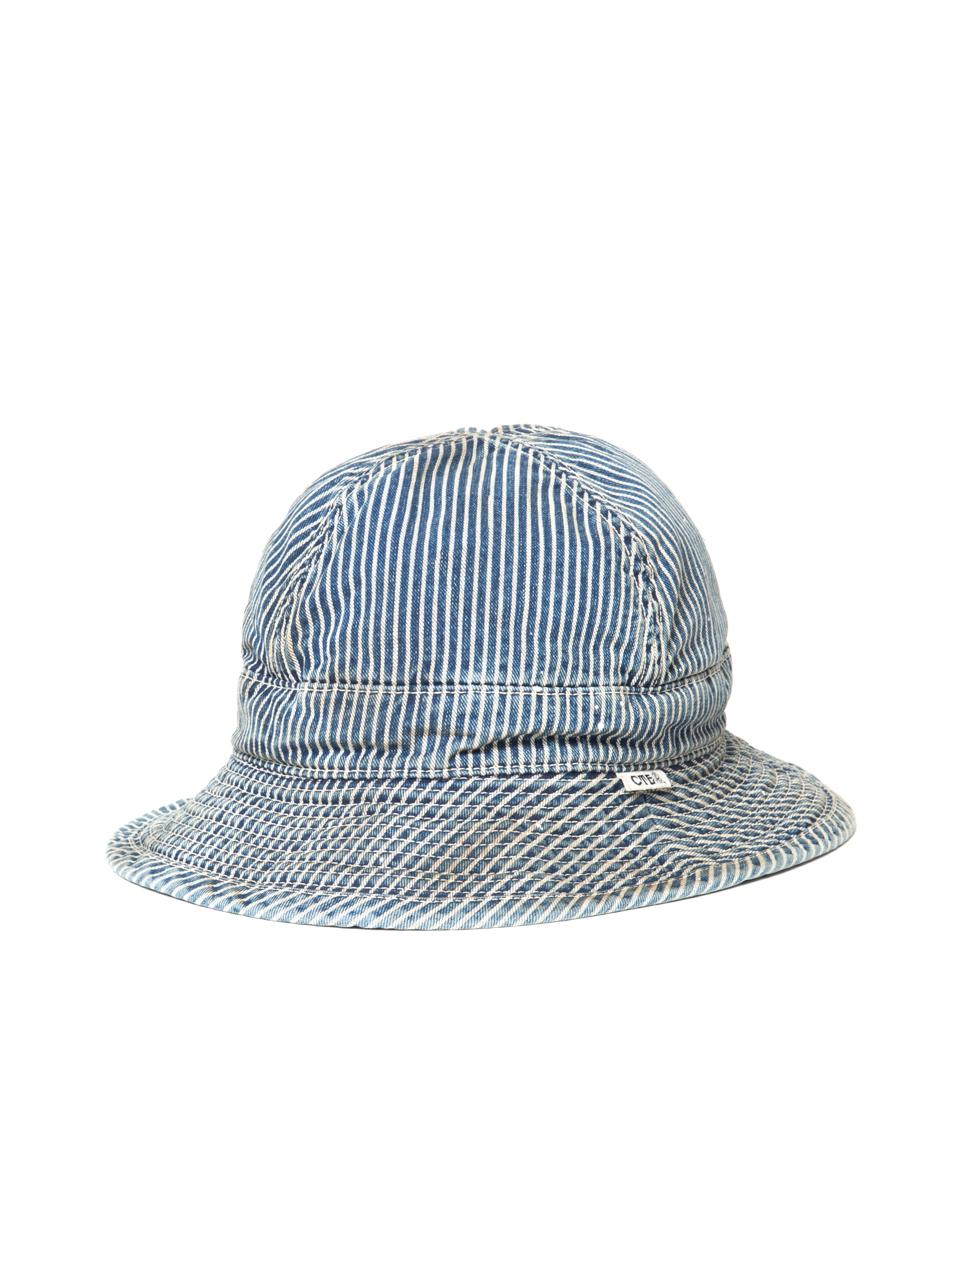 Junkman Hat-Hickory-